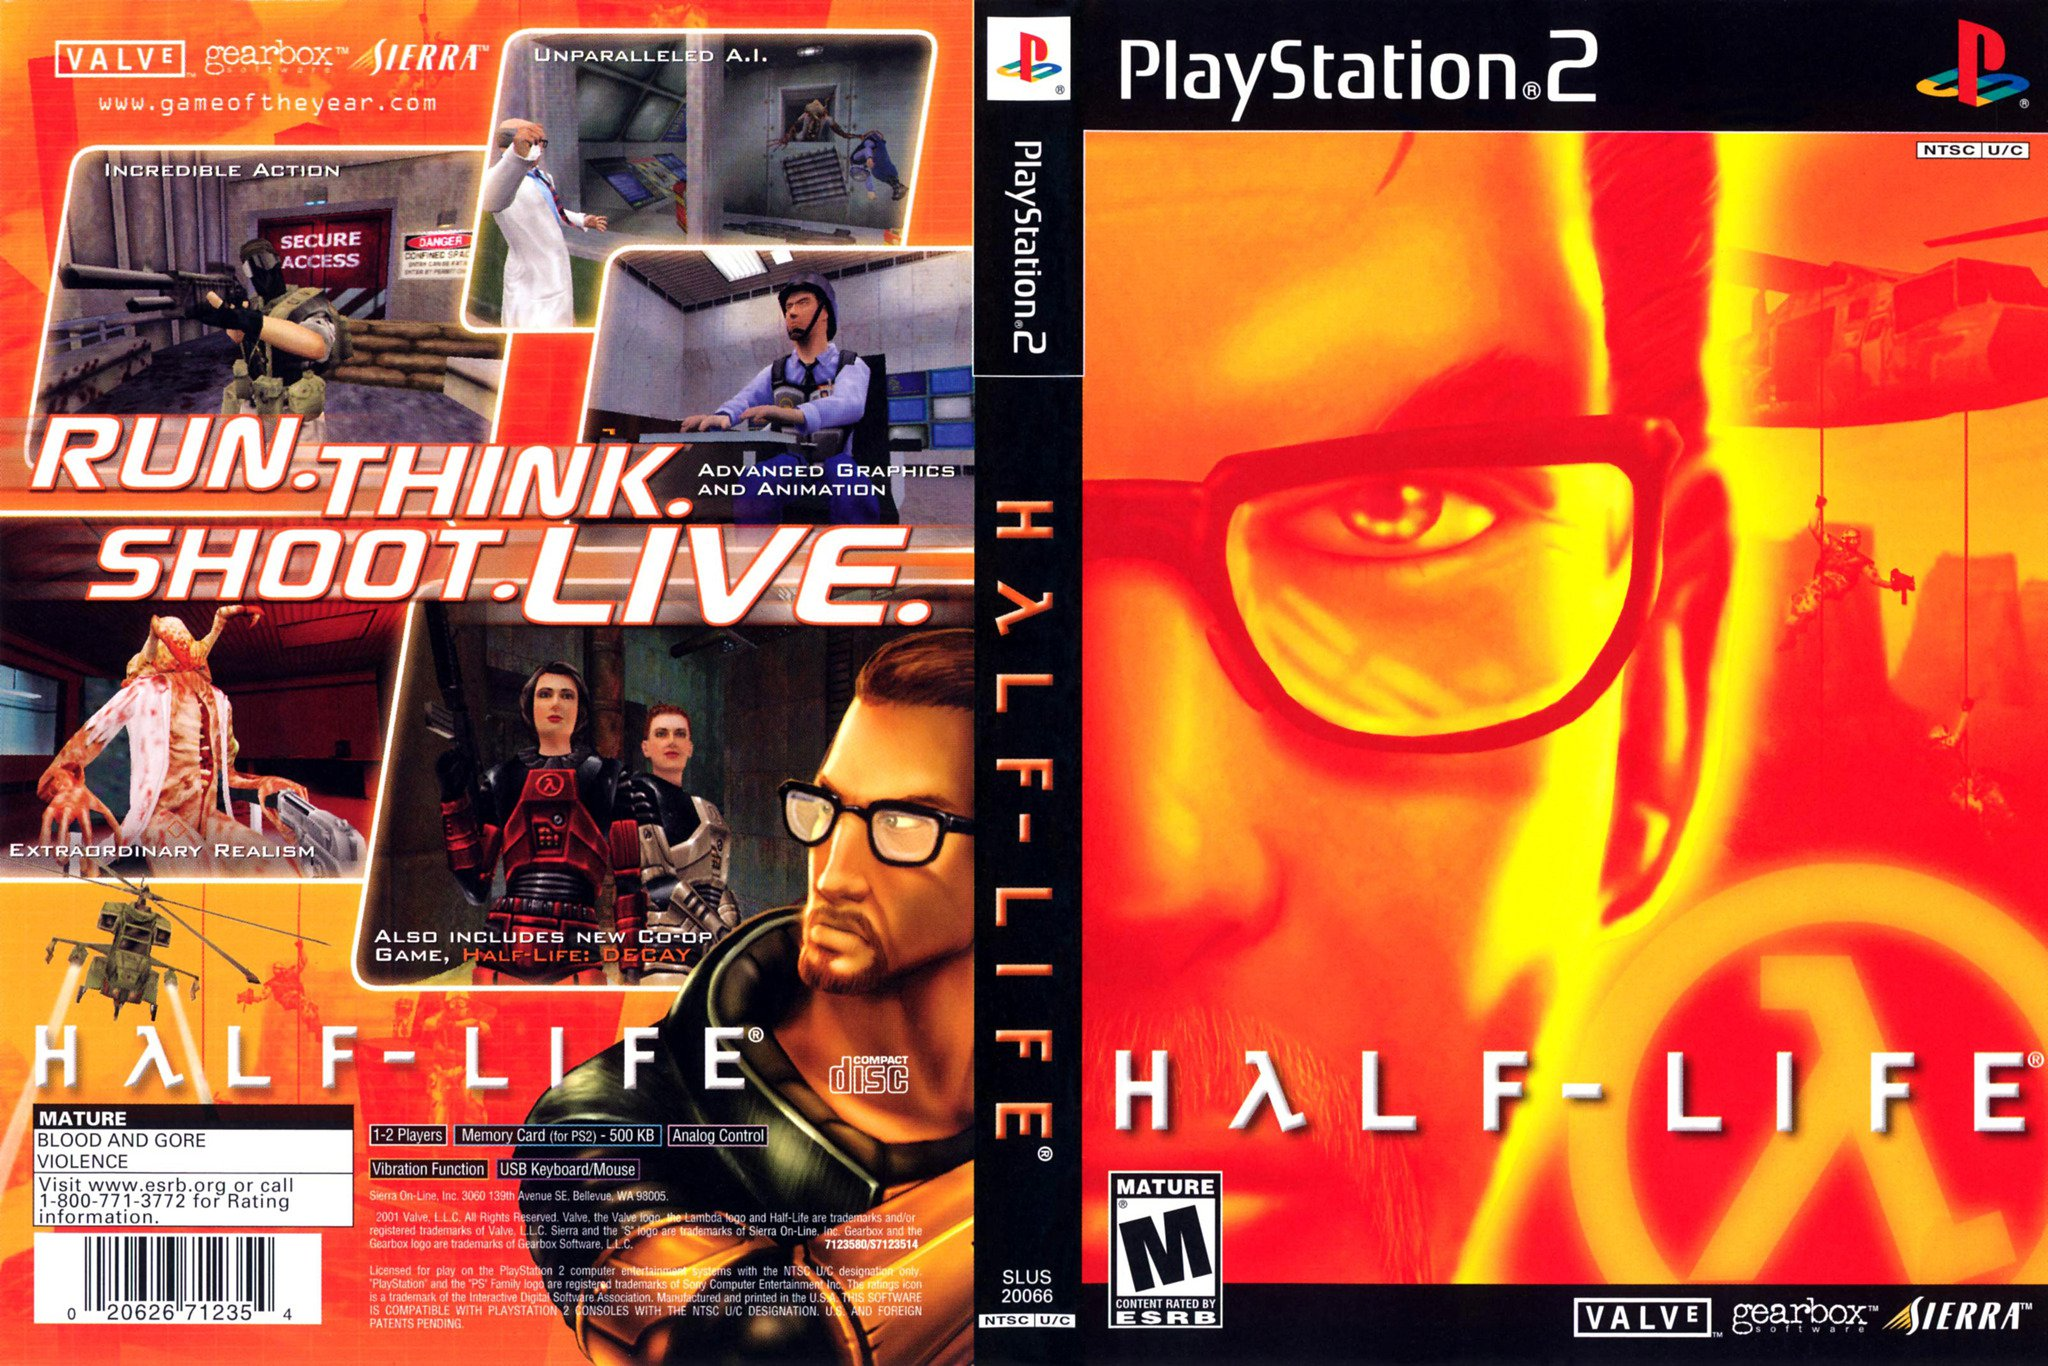 Half-Life PlayStation 2 Port (Xash) mod - Mod DB